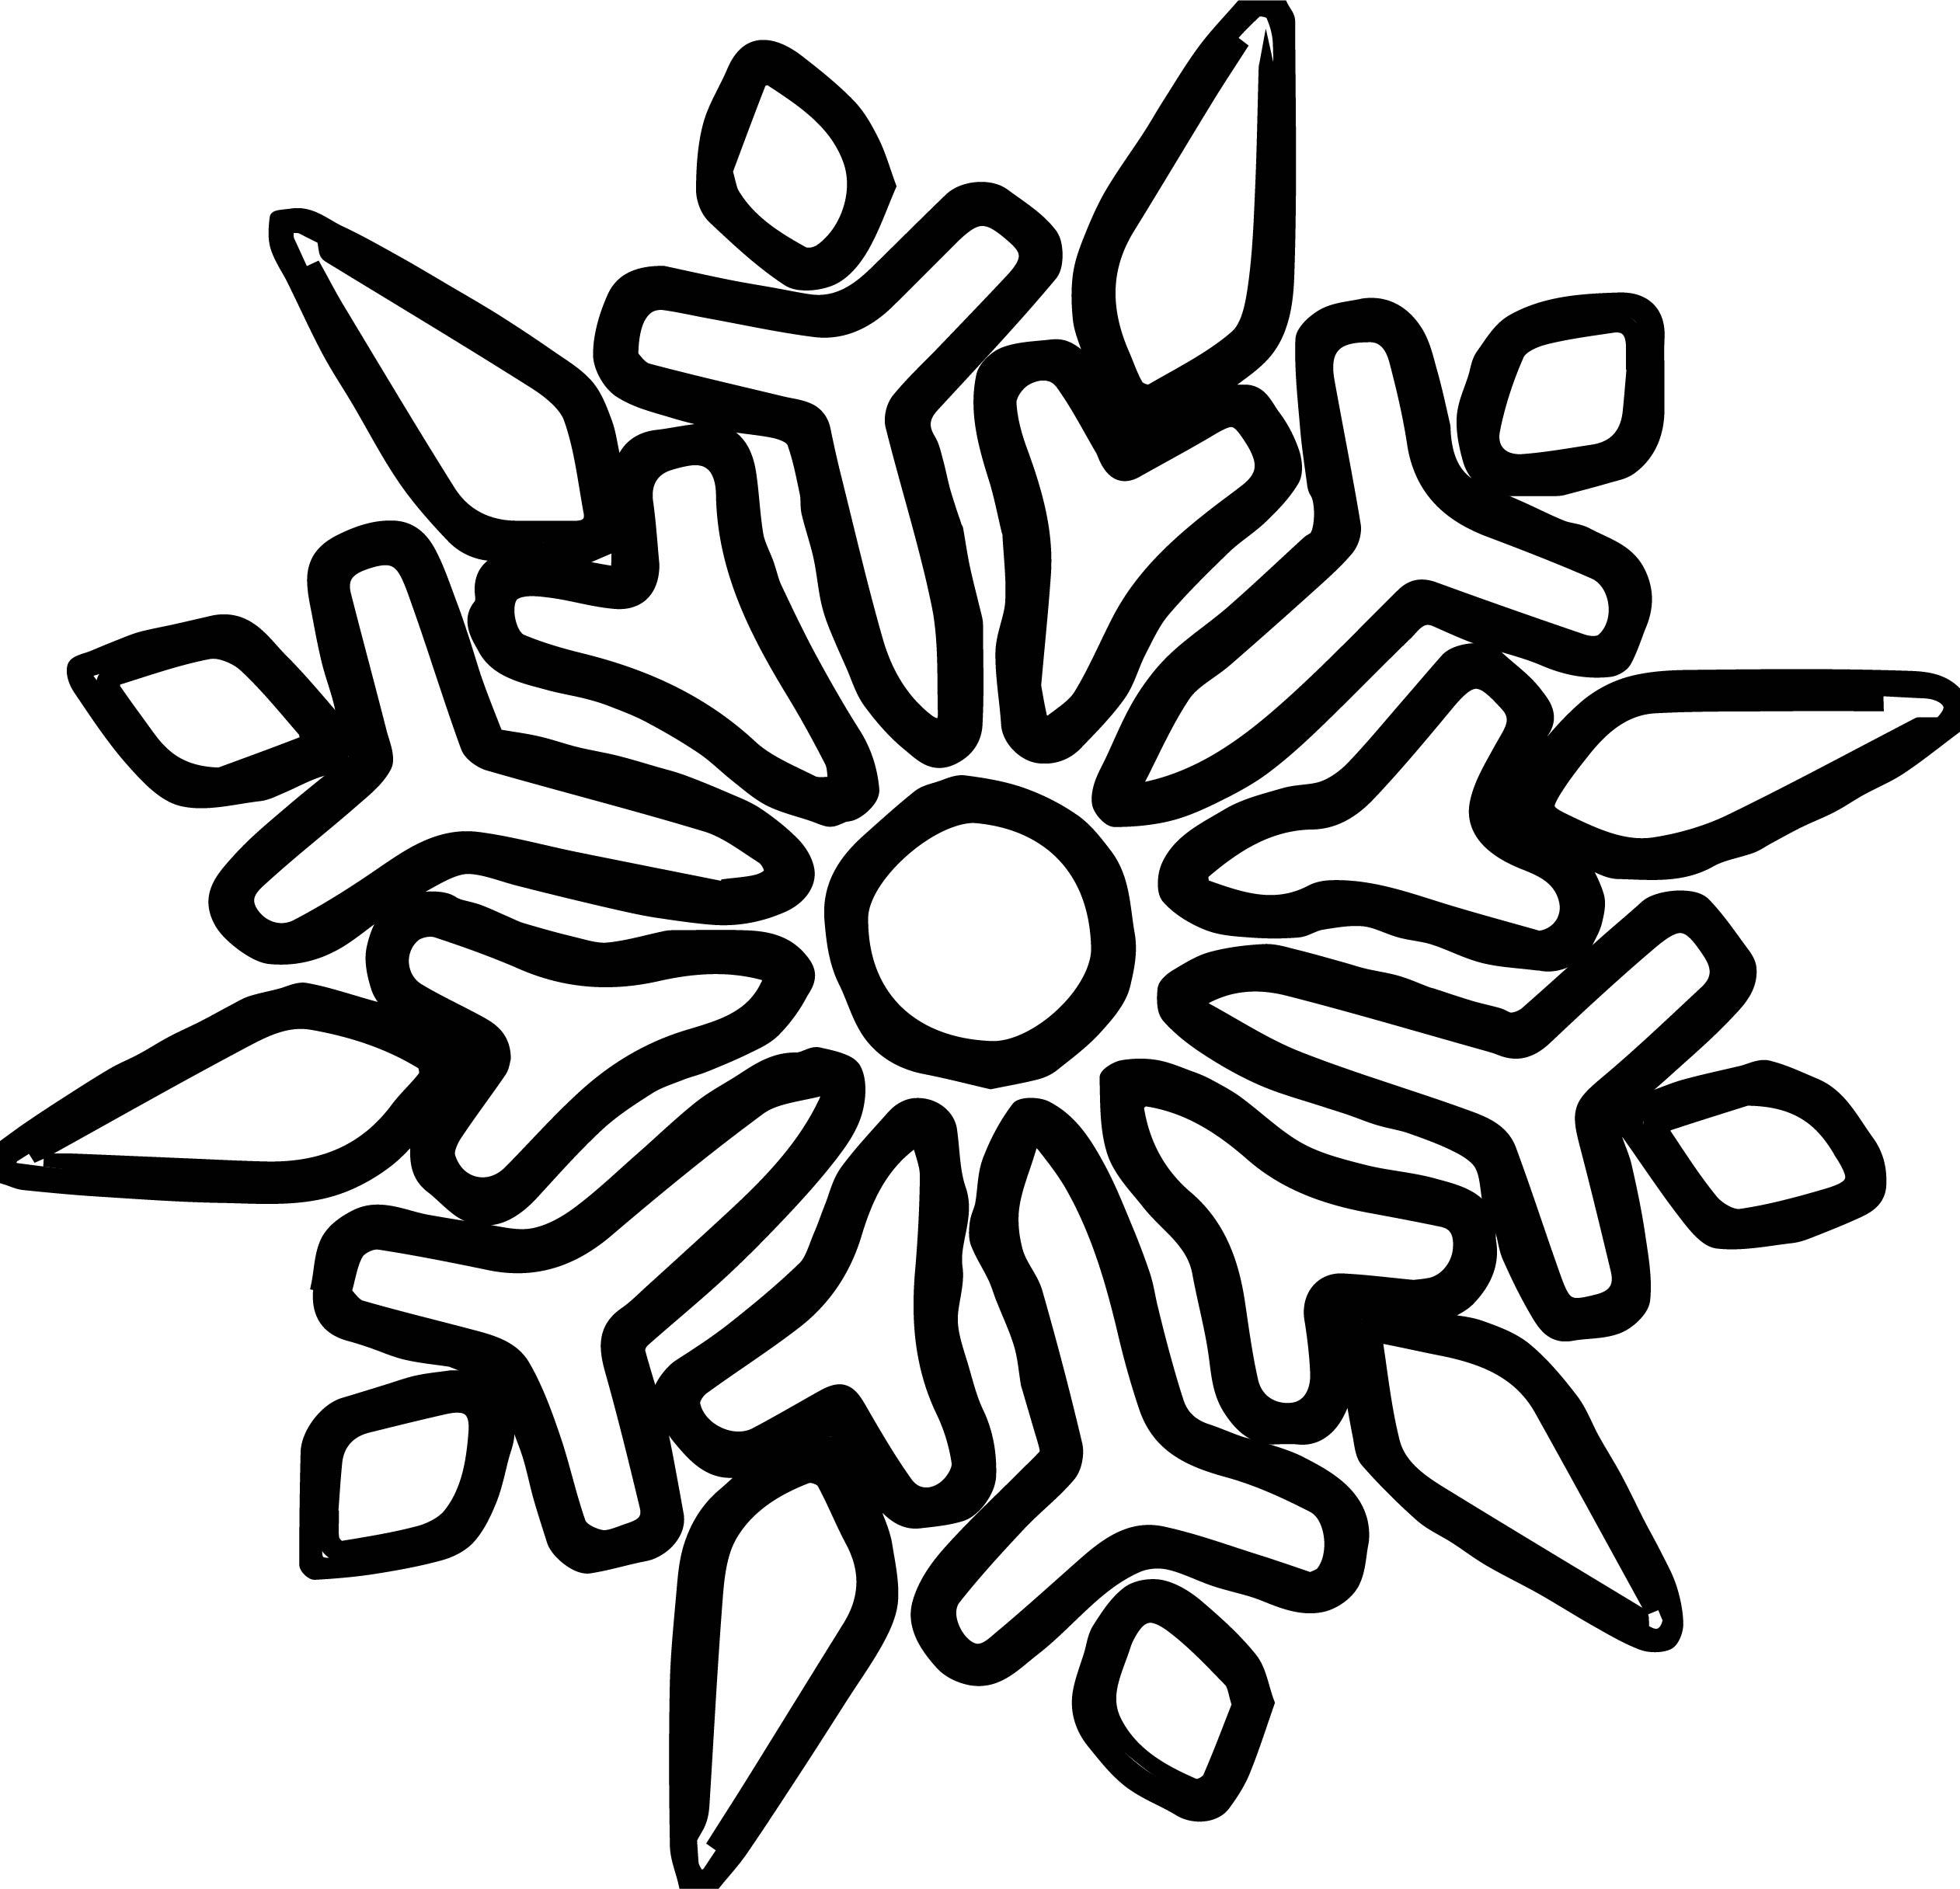 Snowflake Coloring Page WeColoringPage 38